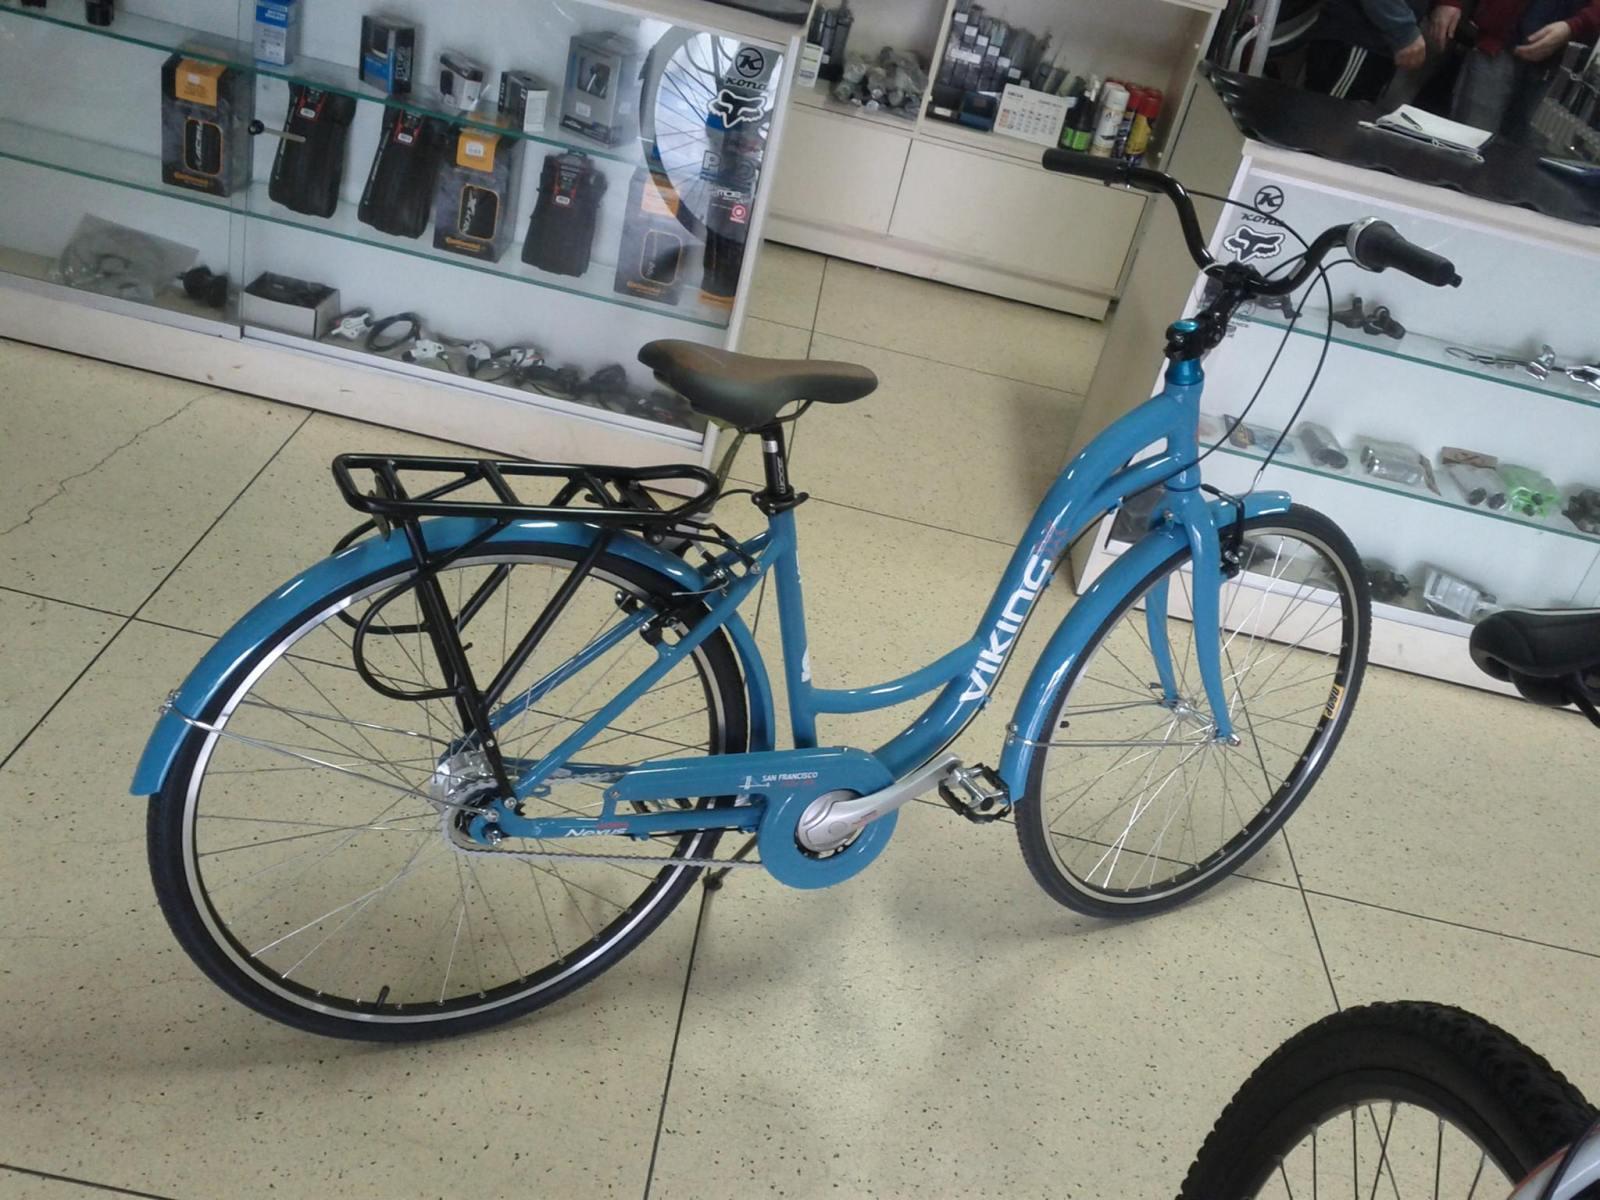 Quero comprar bicicleta 2dinfj4